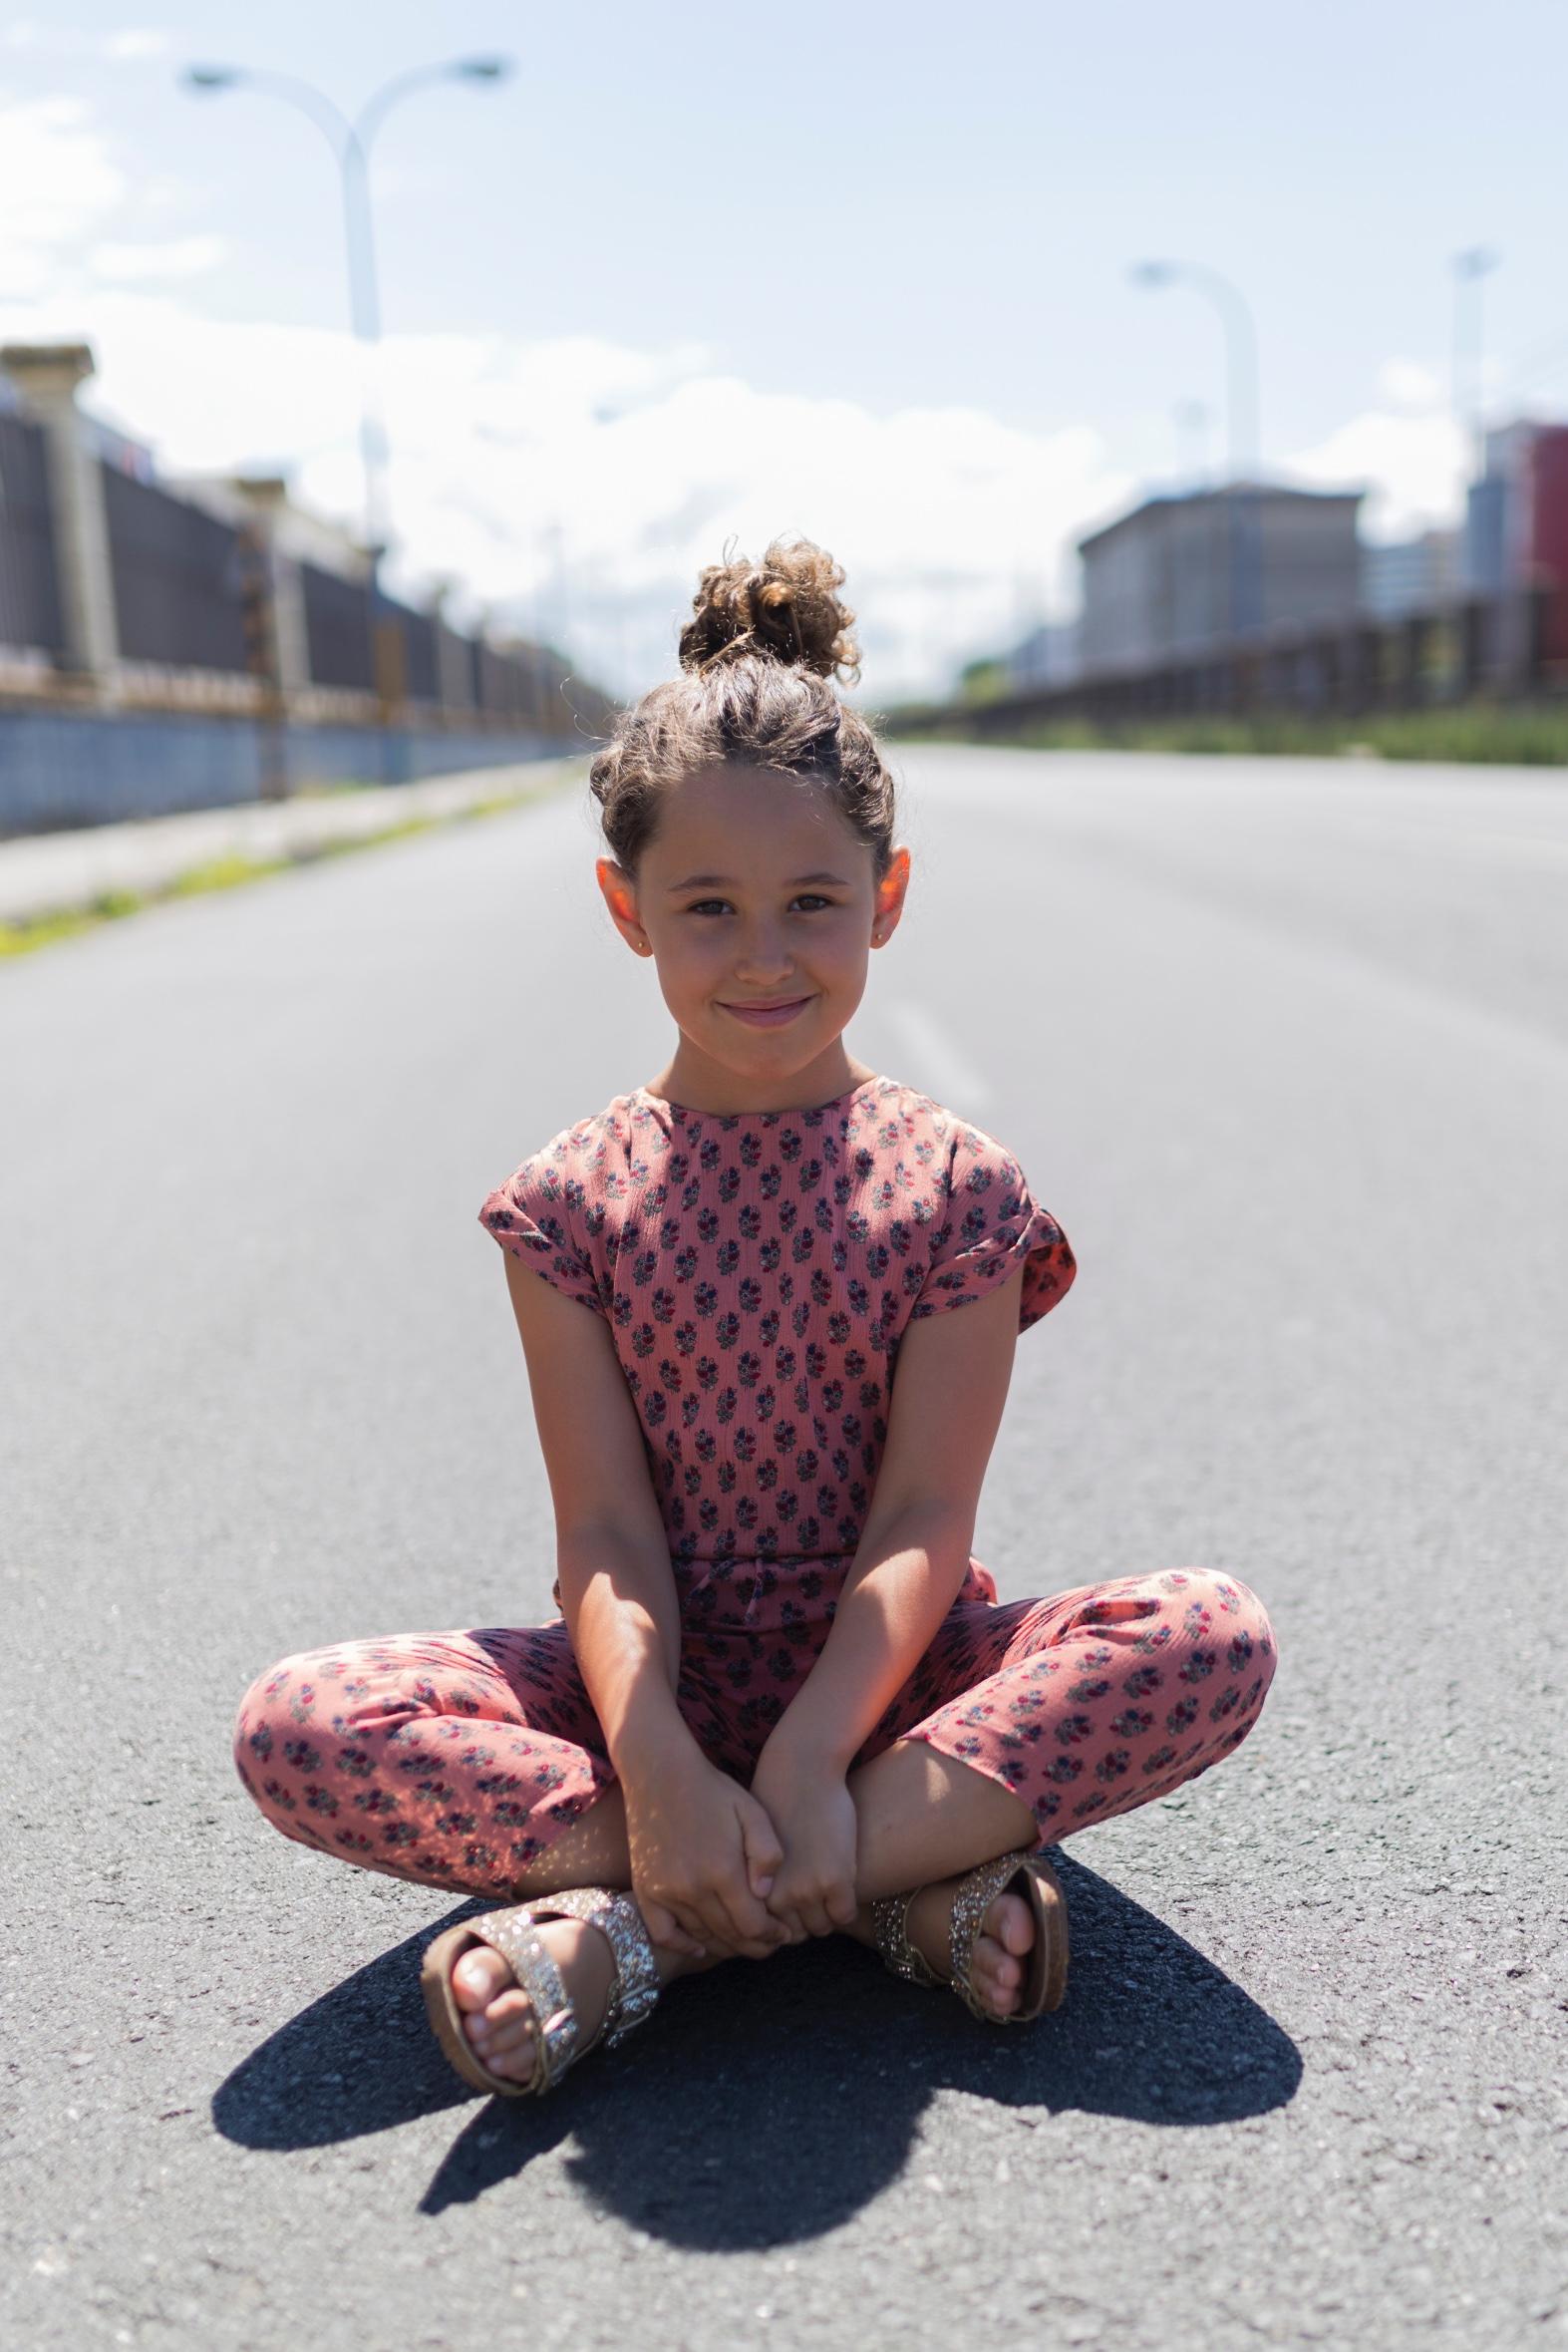 moda infantil-niños-coruña- jimena look- kids- miniblogger- ministyle- Soft- streetstyle- zara- zara kids- zara soft-descalzaporelparque-fashion kids